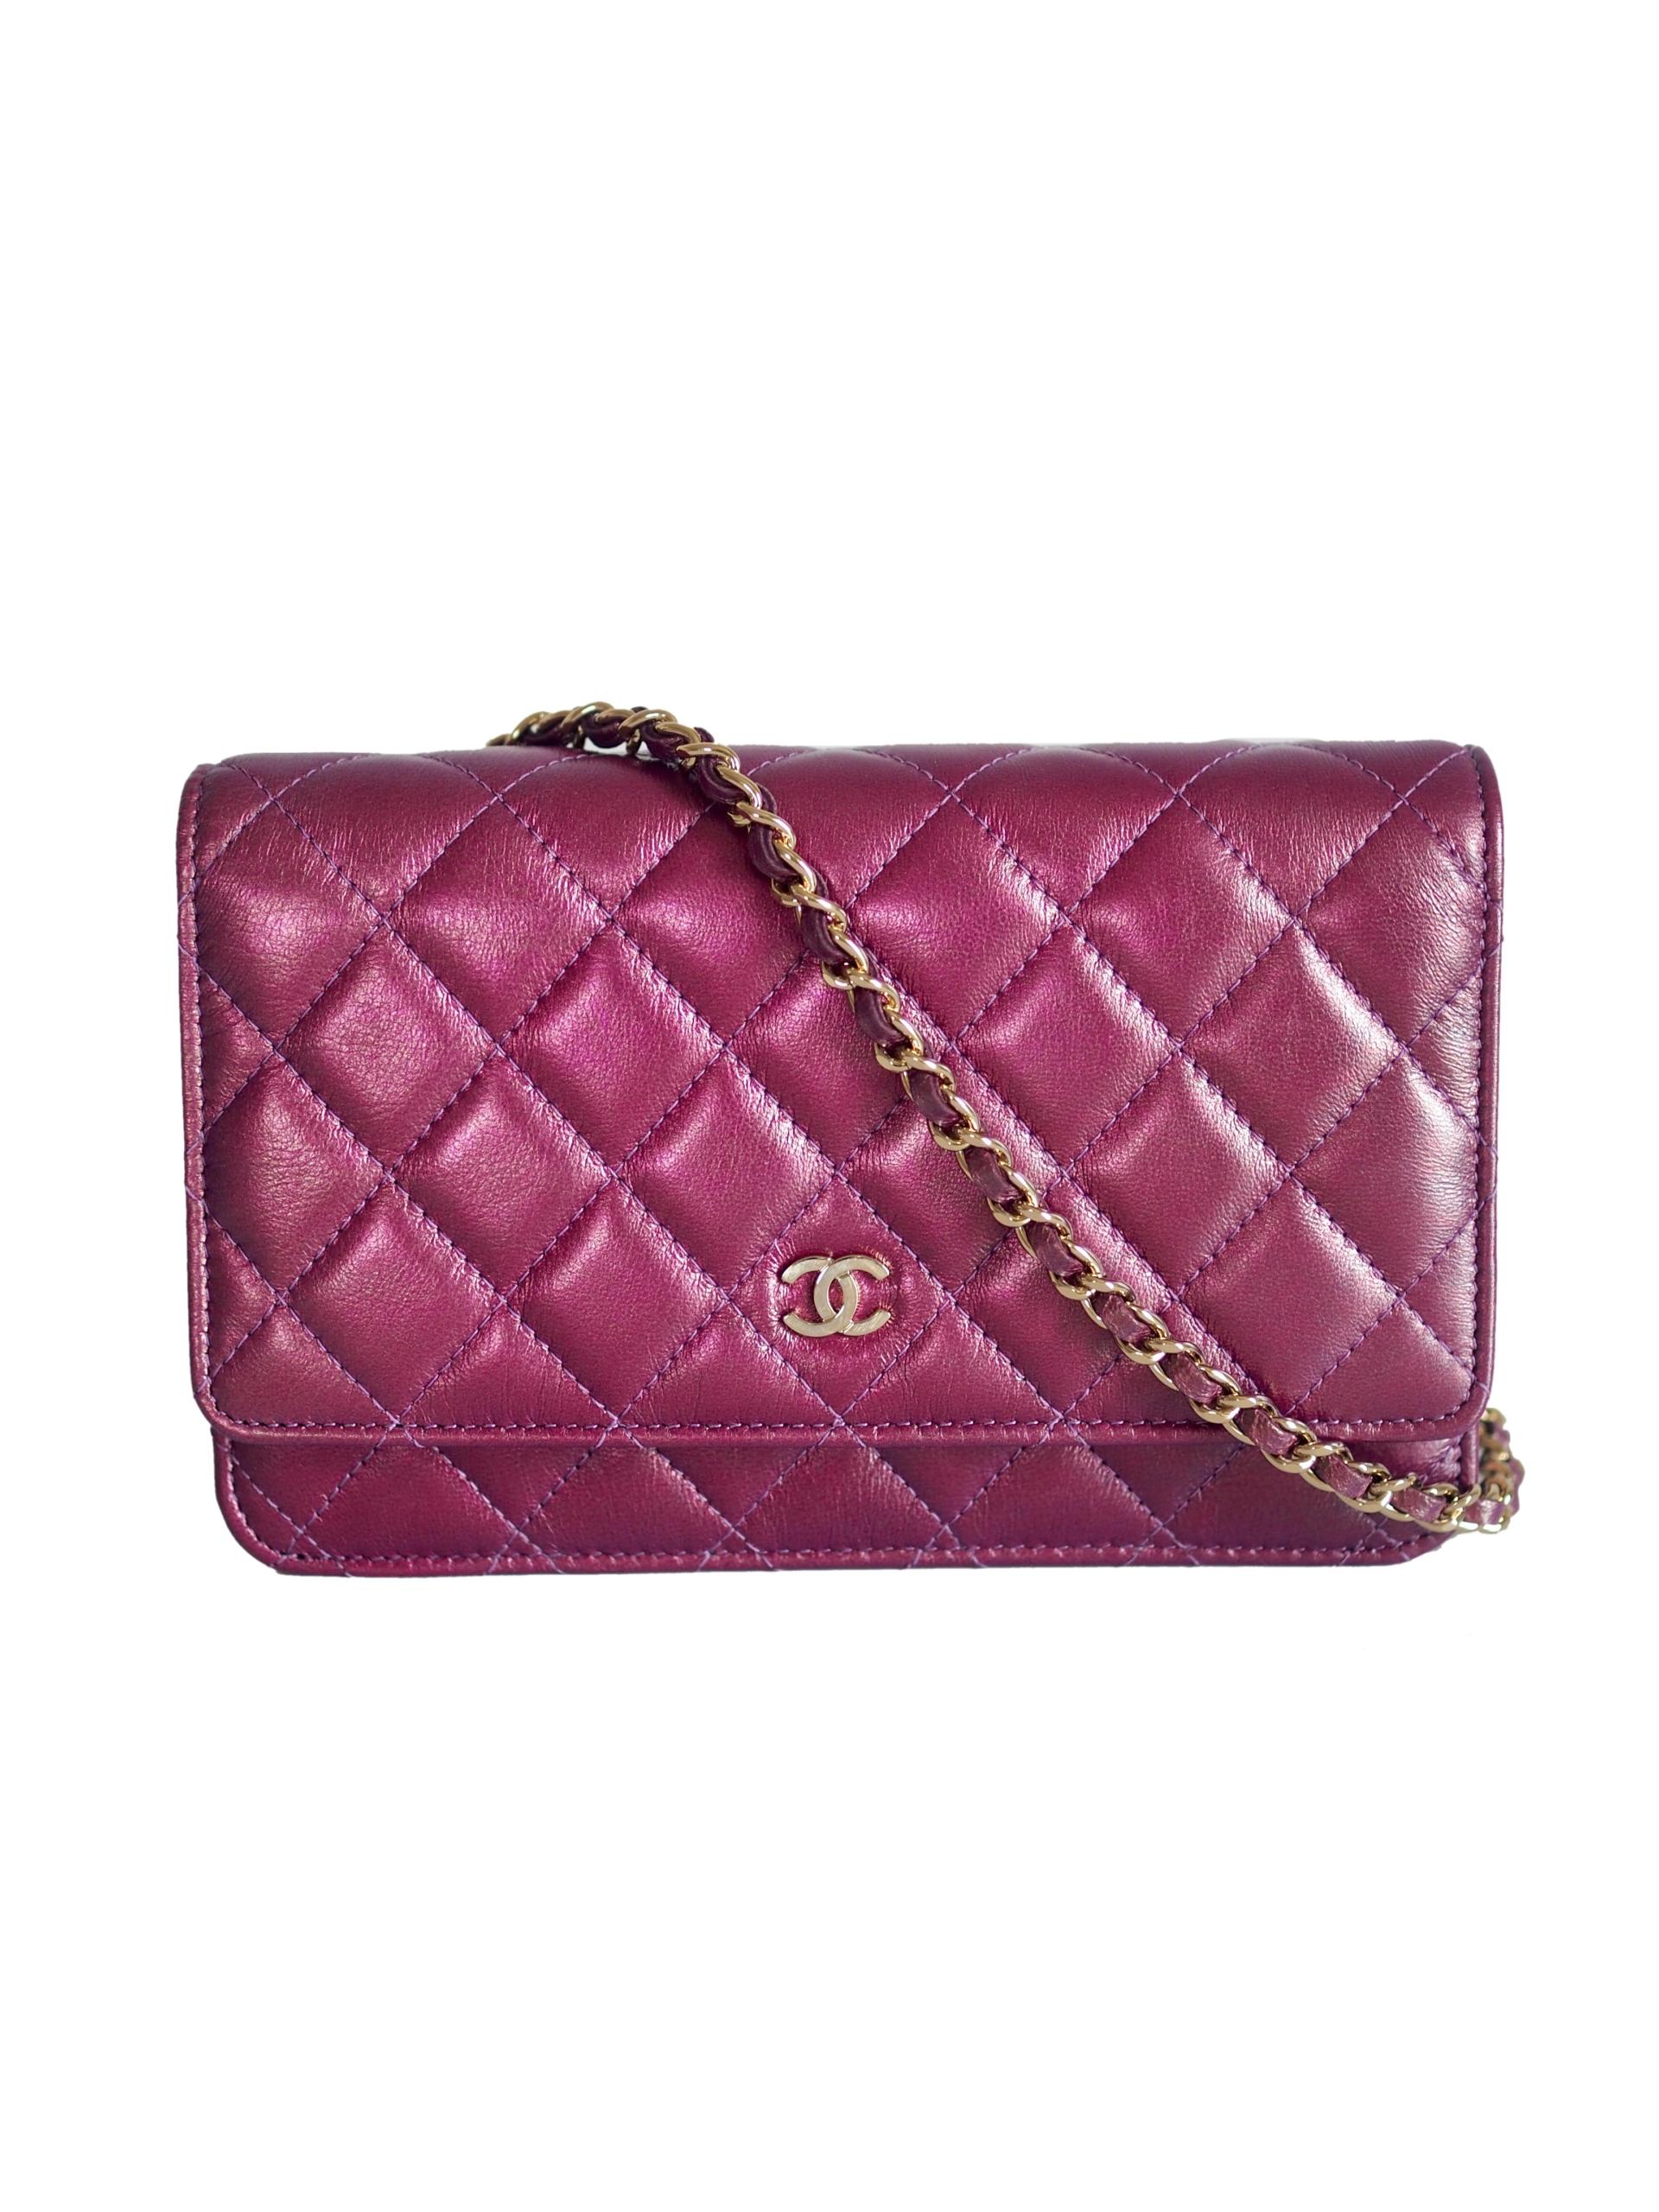 Bag CHANEL WOC Purple Iridescent Lambskin GHW